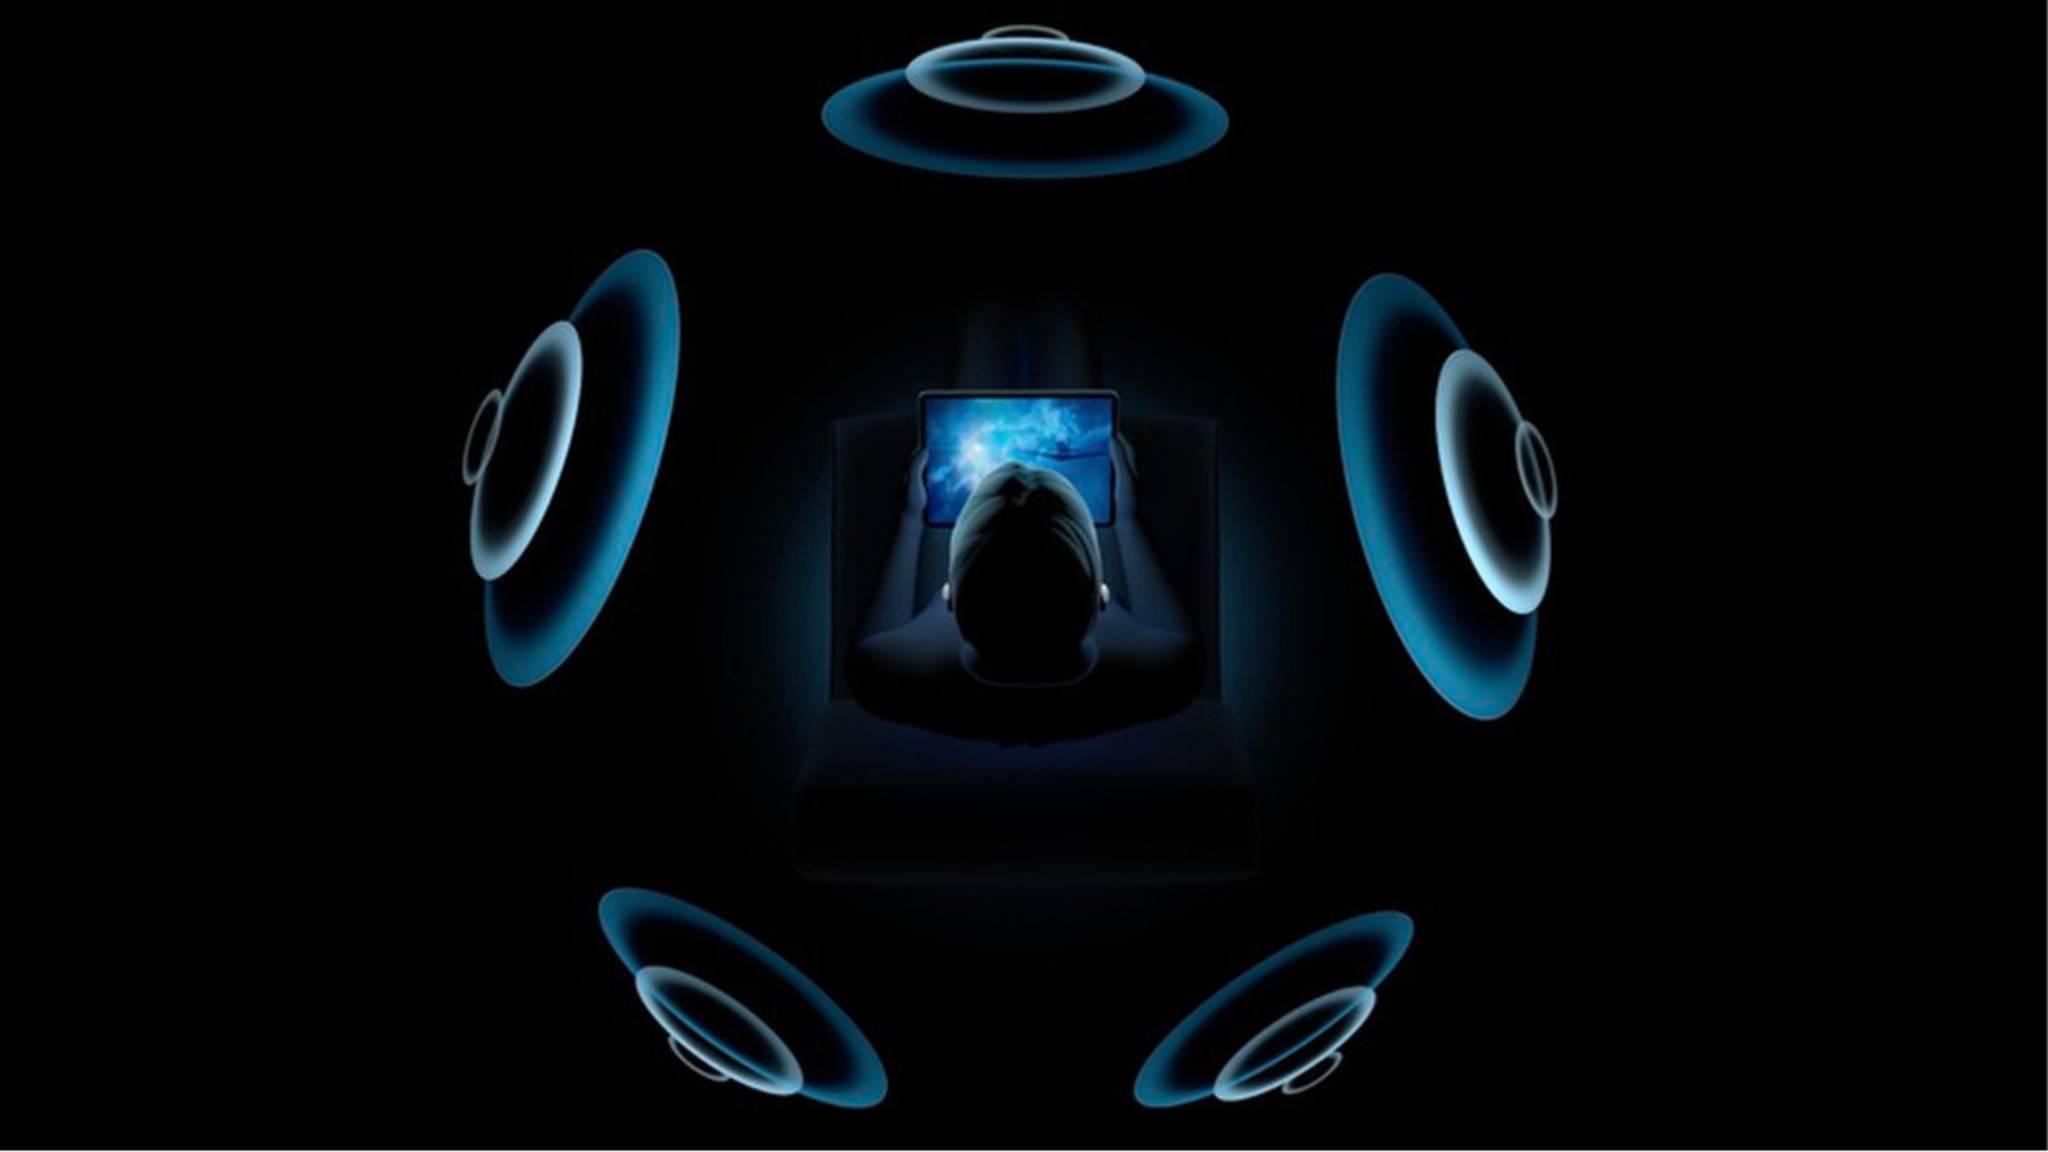 surround sound apple airpods pro